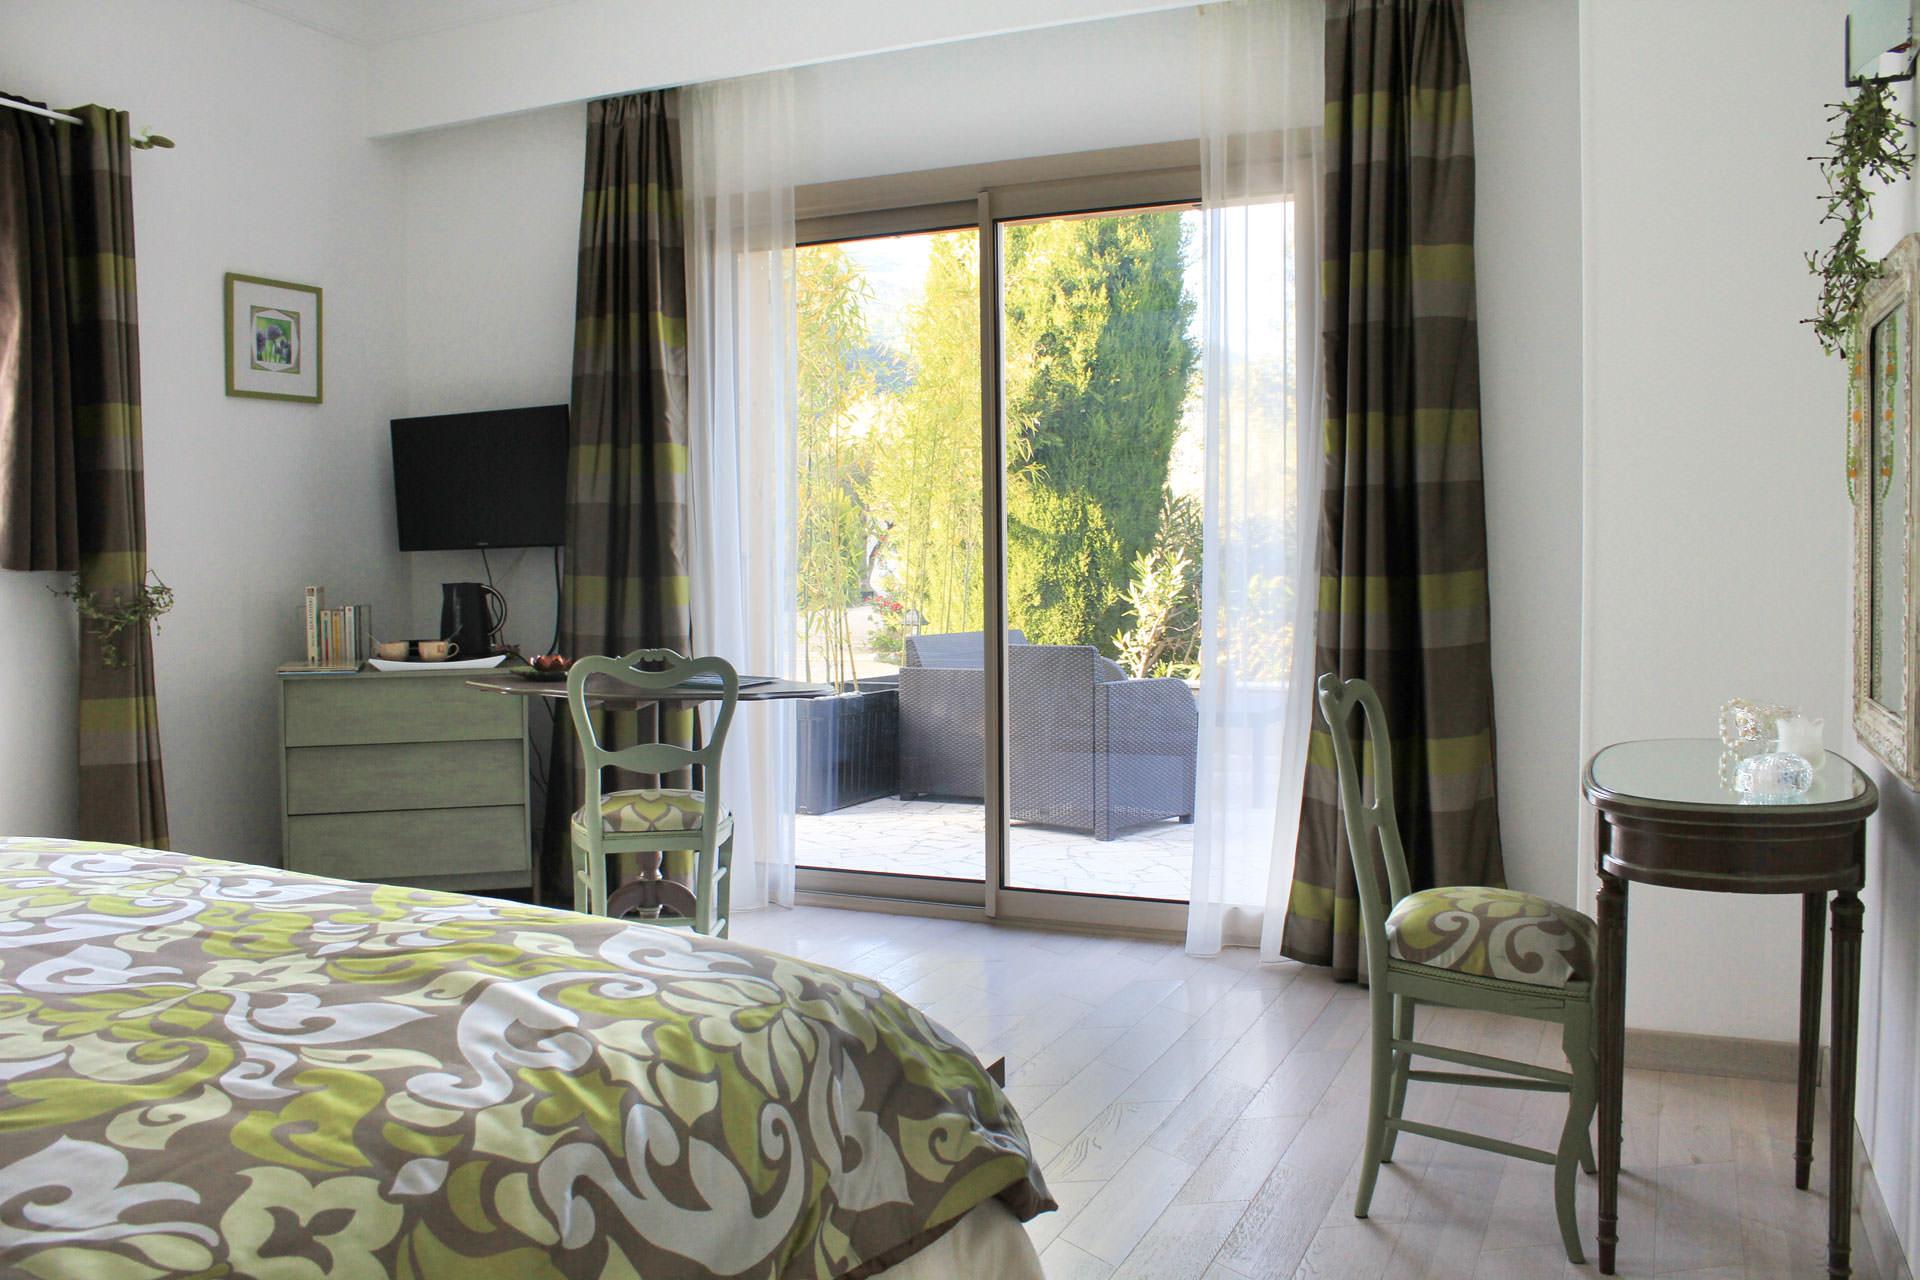 chambre d 39 h tes riviera proche de nice c te d 39 azur. Black Bedroom Furniture Sets. Home Design Ideas